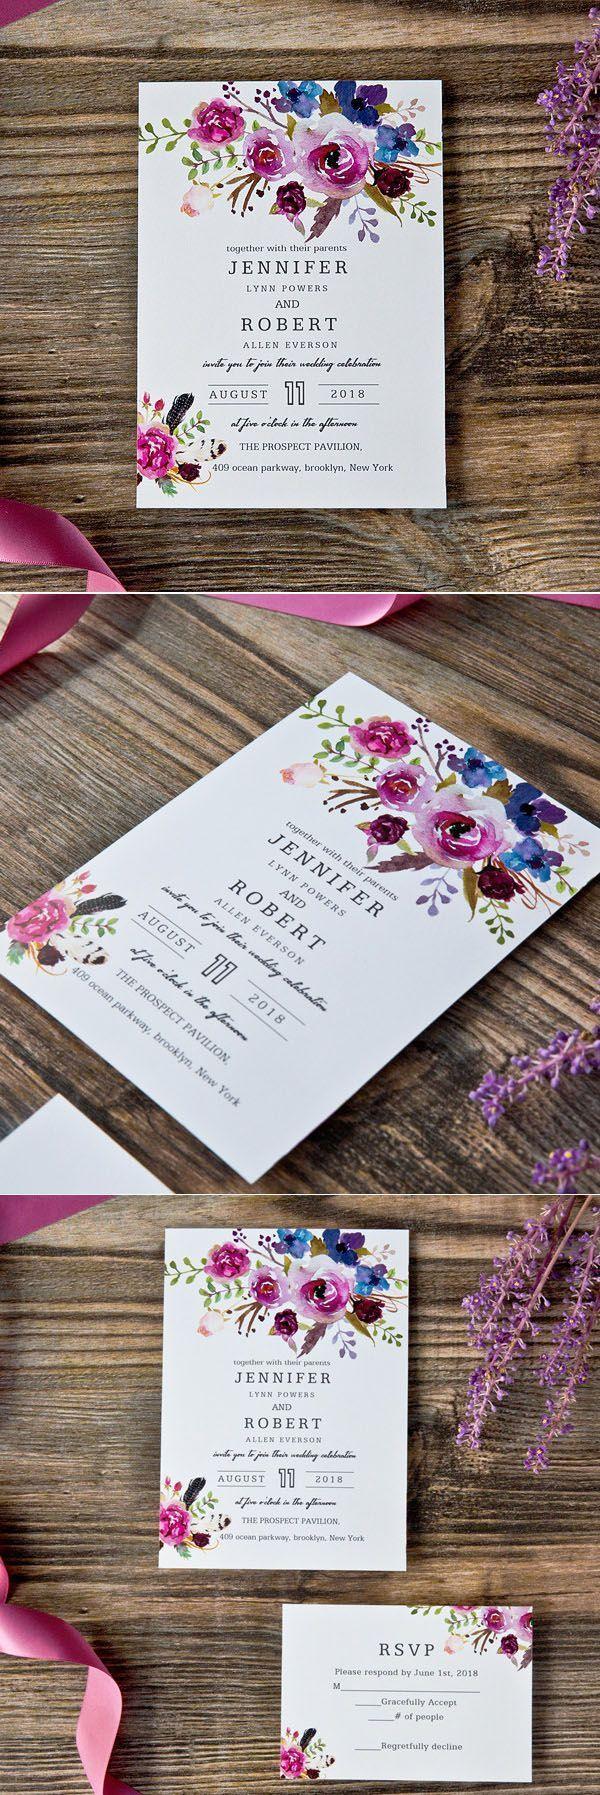 floral shades of purpe boho style wedding